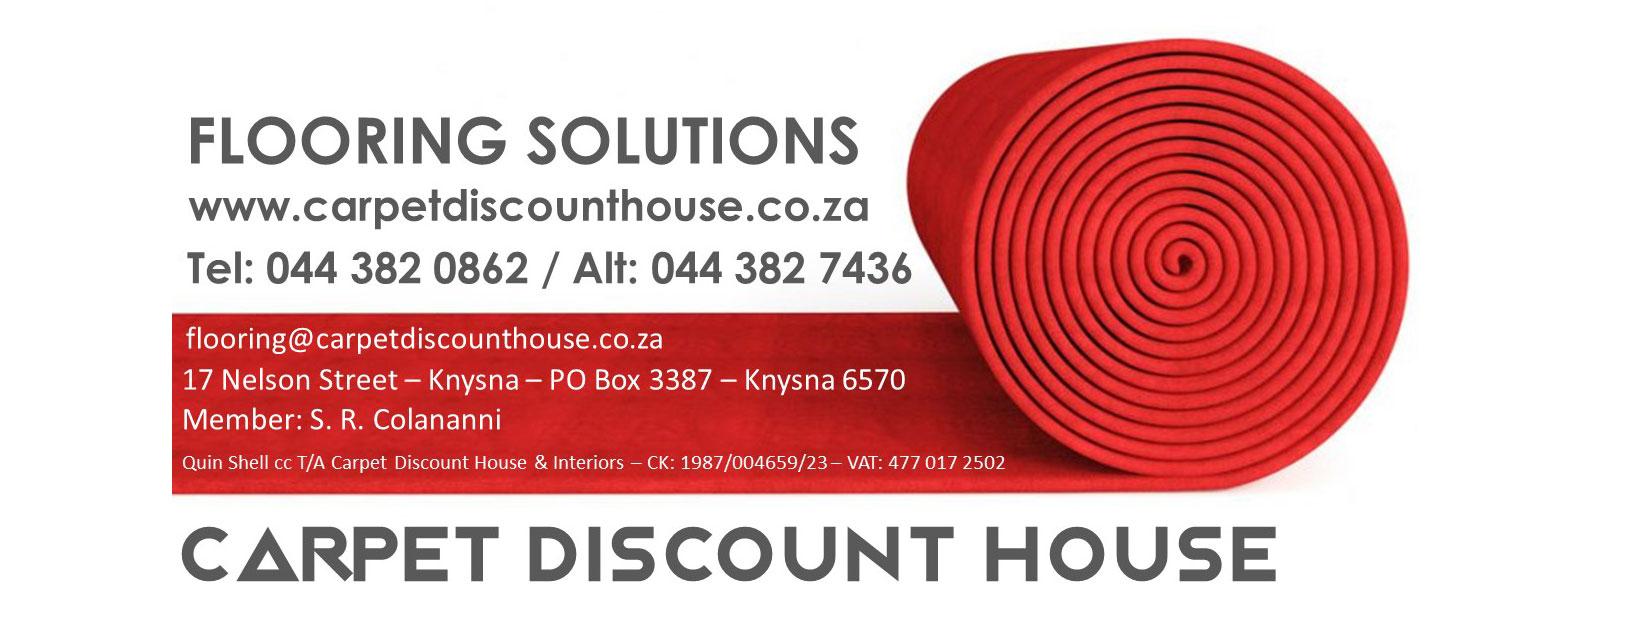 carpet discount house logo